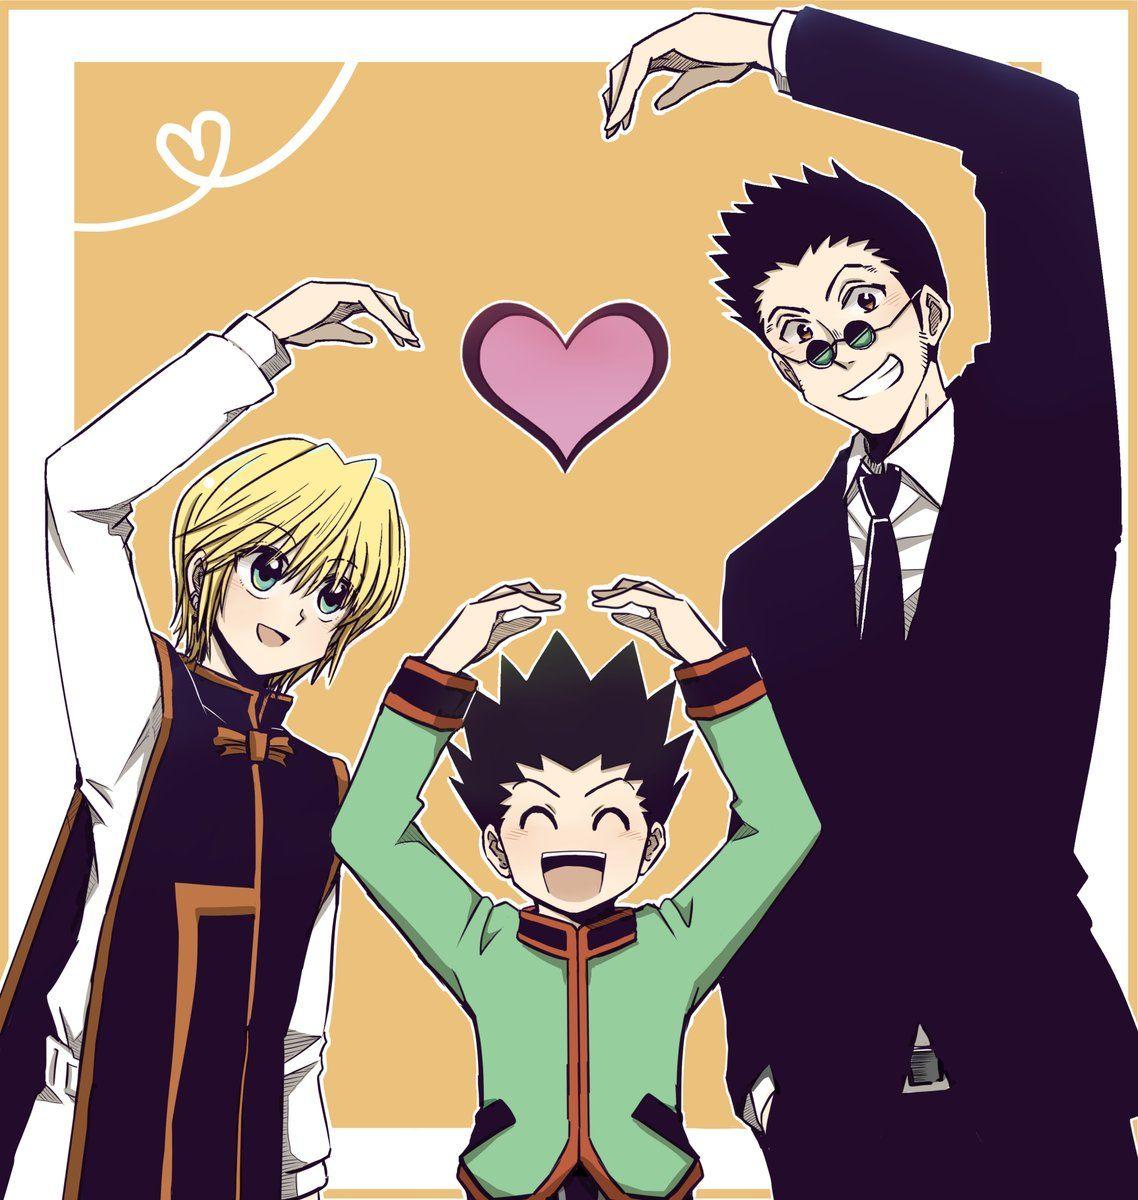 Twitter hxh pinterest anime hisoka and manga twitter voltagebd Gallery